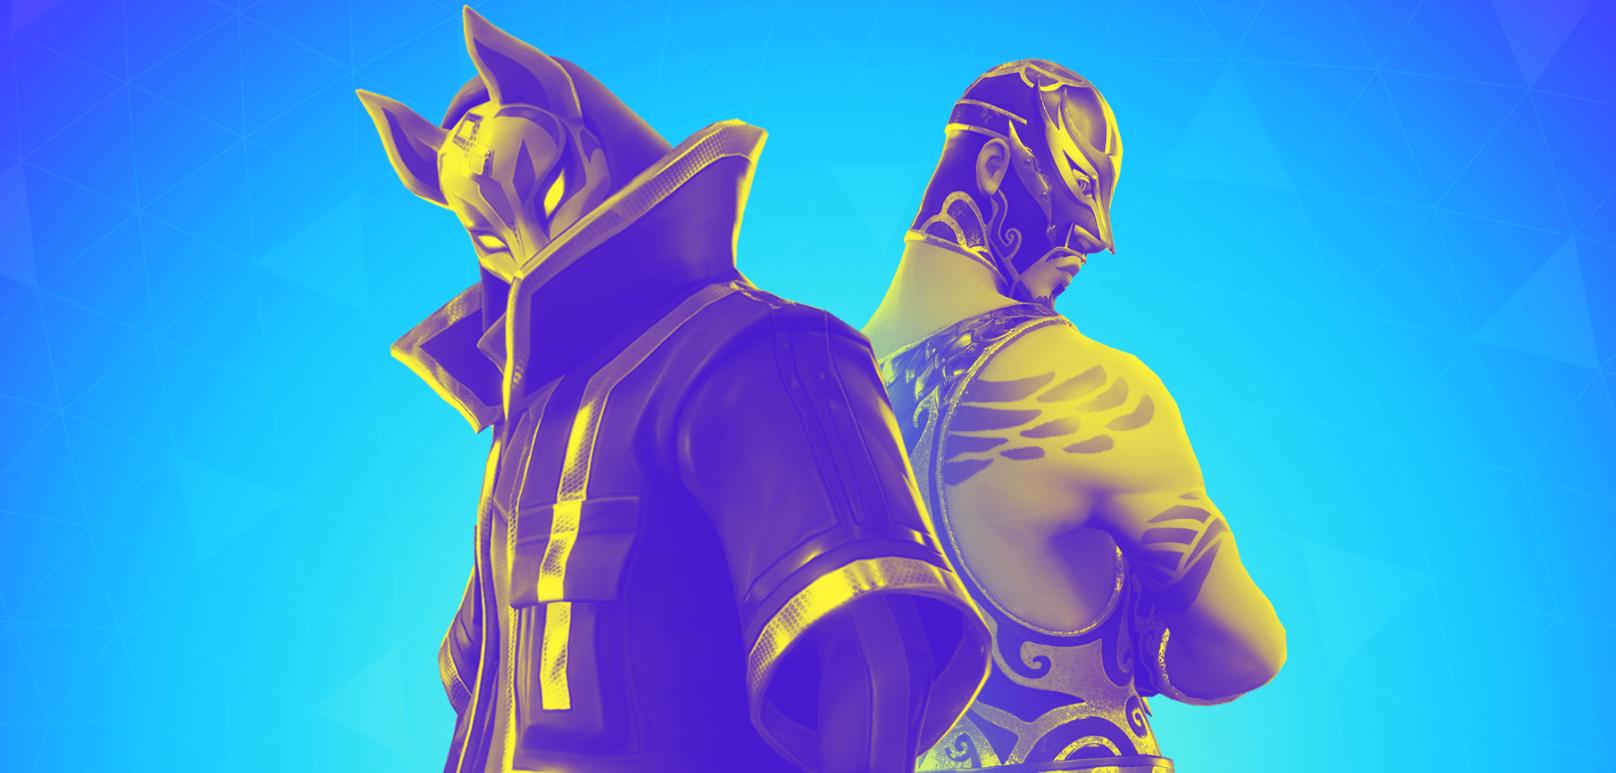 Fortnite's in-game tournaments begin October 16